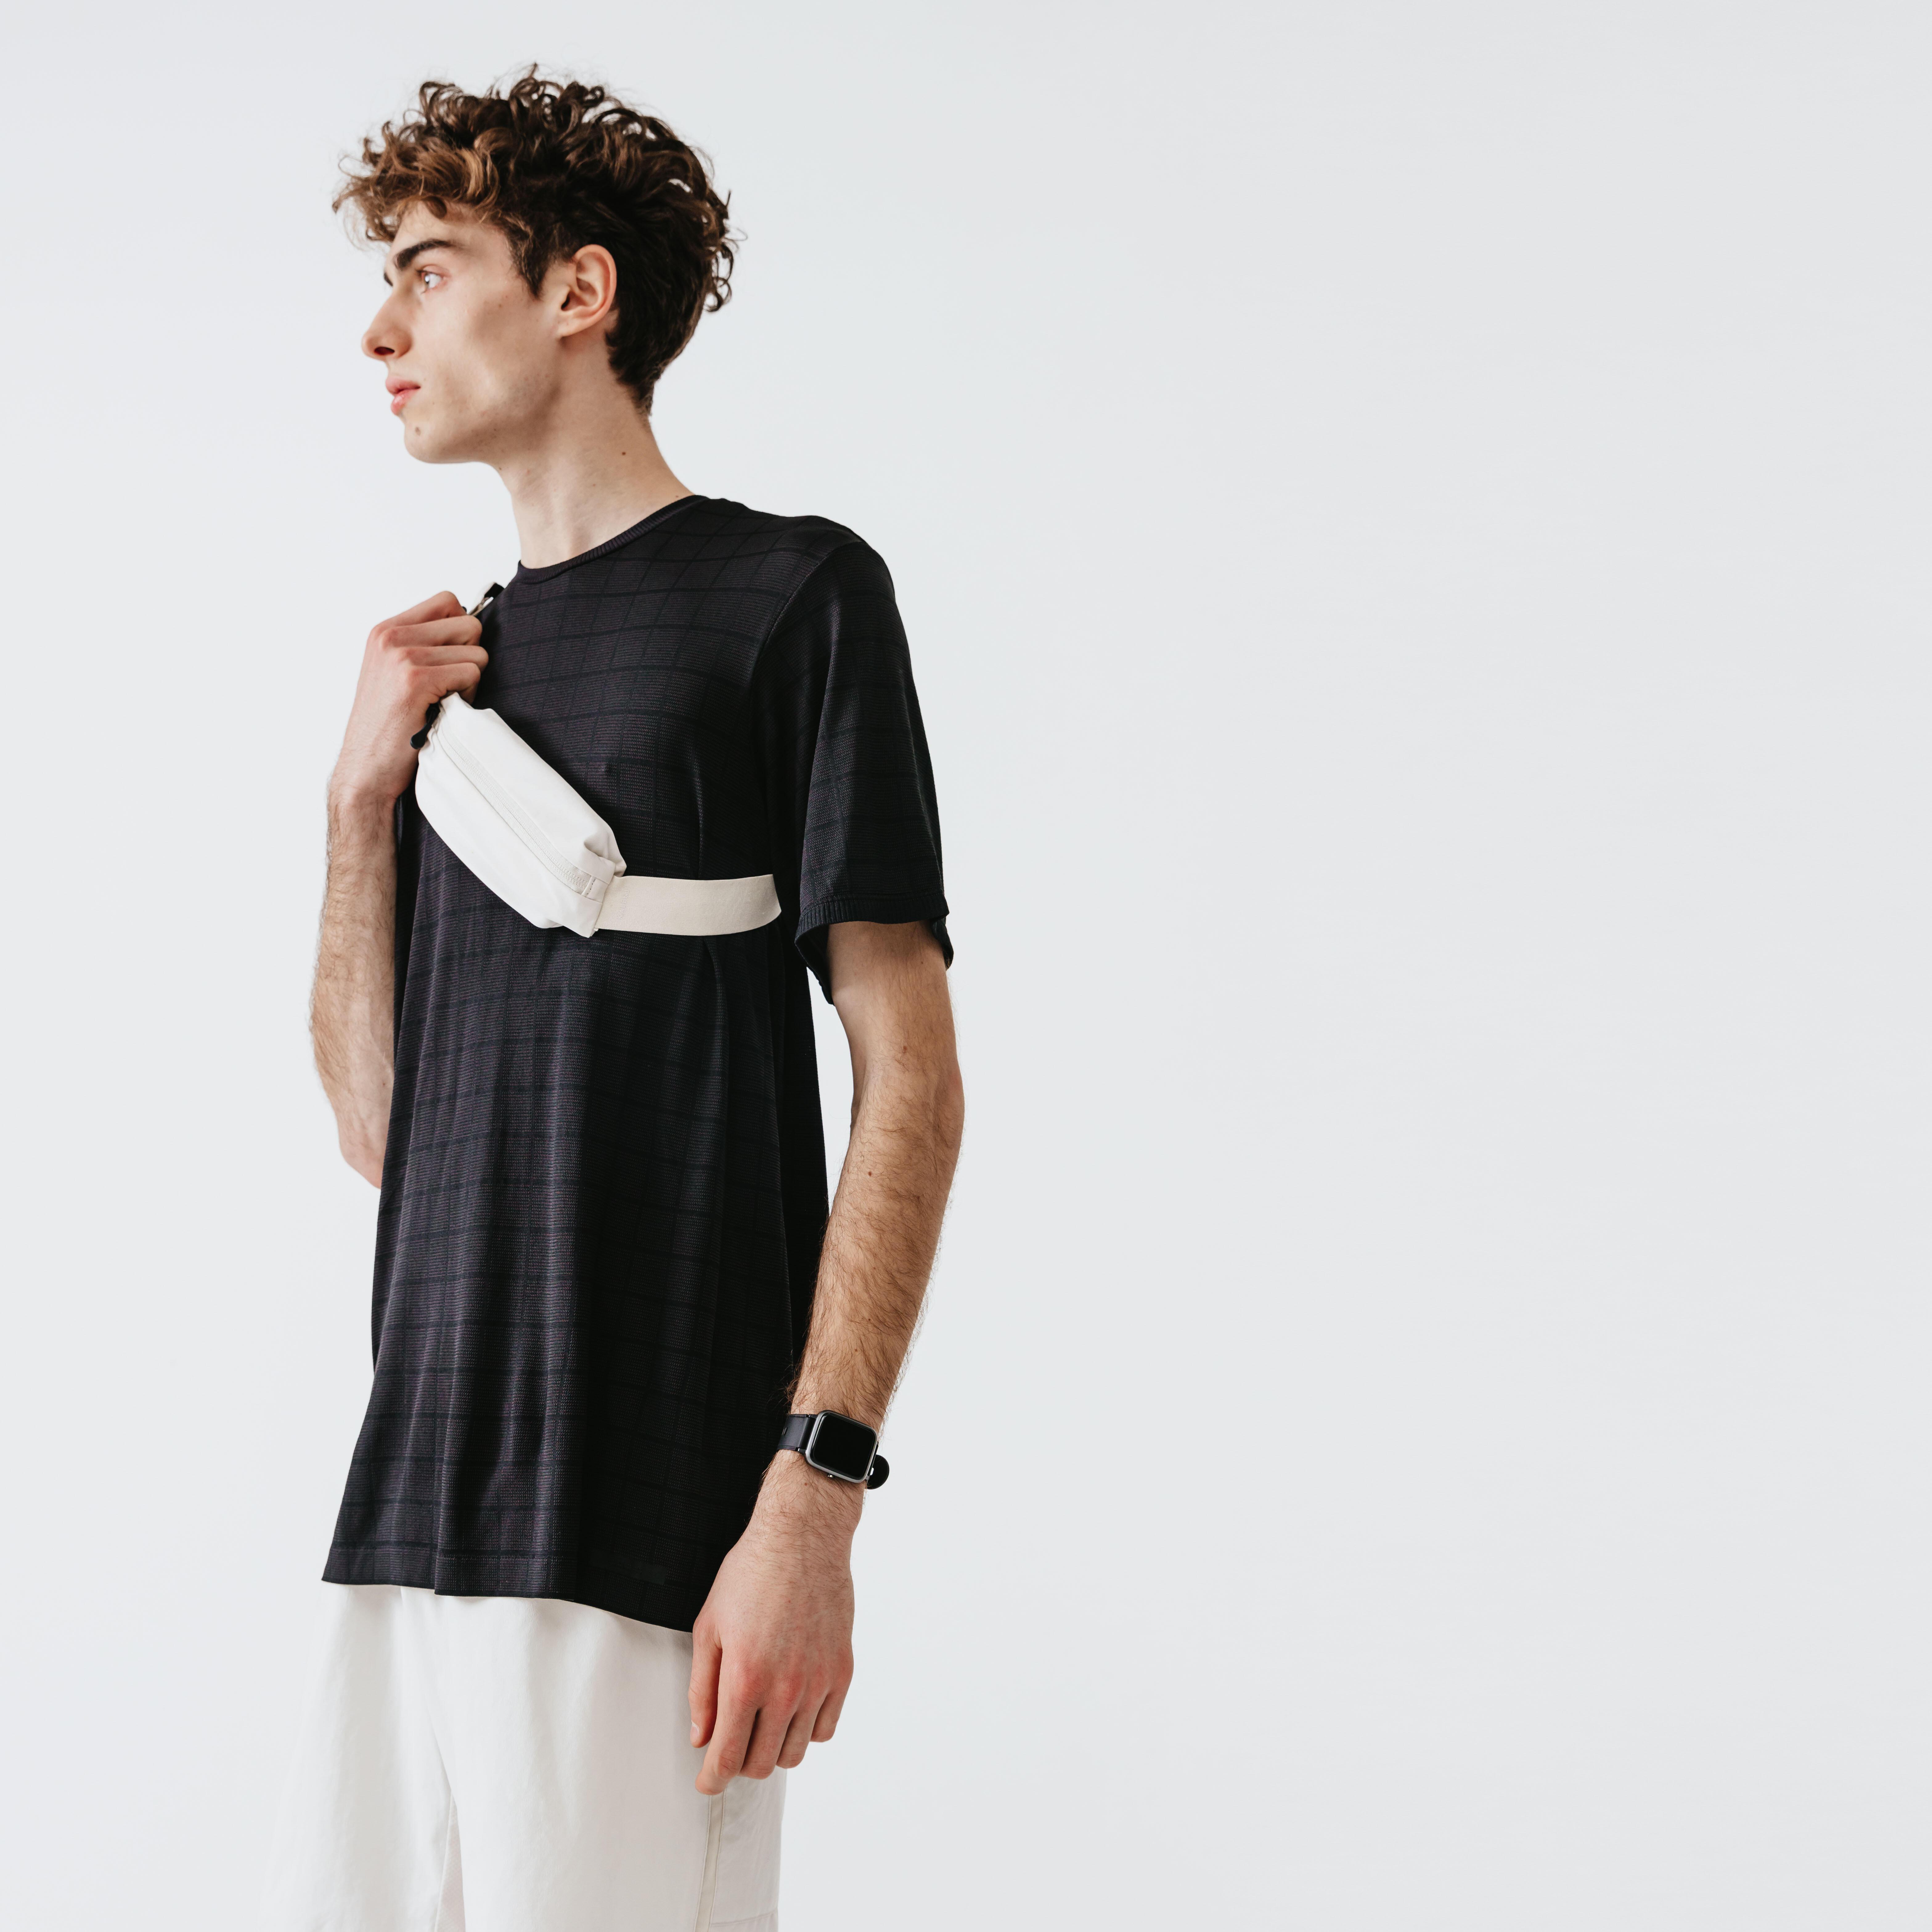 Tricou Dry+Feel Bărbați imagine